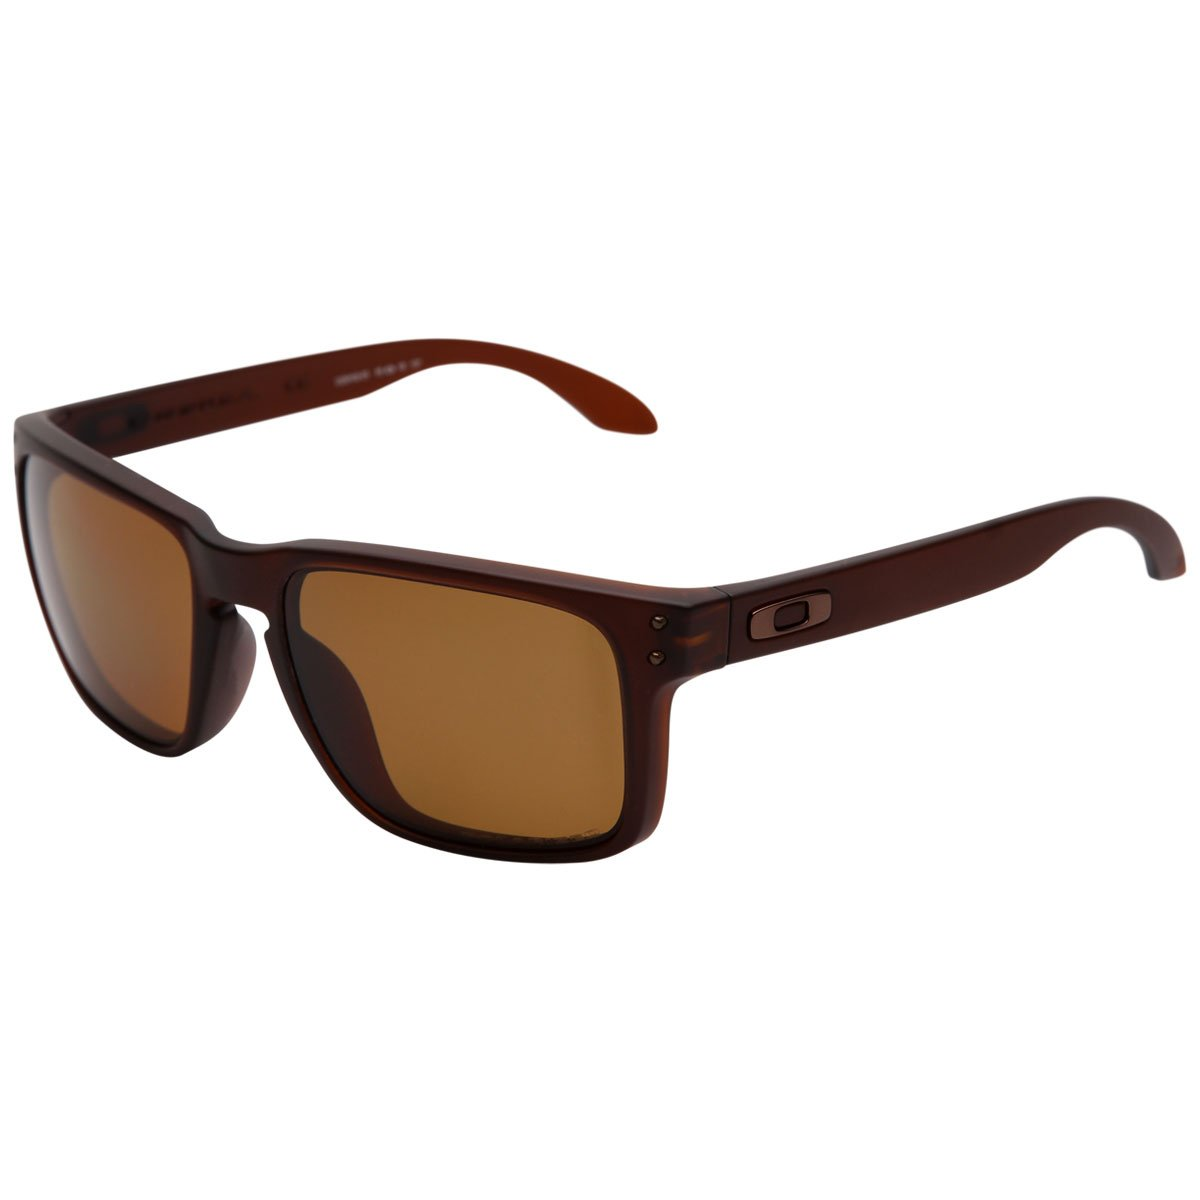 ... Compre Agora   Dafiti Brasil Óculos Oakley Holbrook Polarizado  Masculino - Marrom 1a5f7e332f